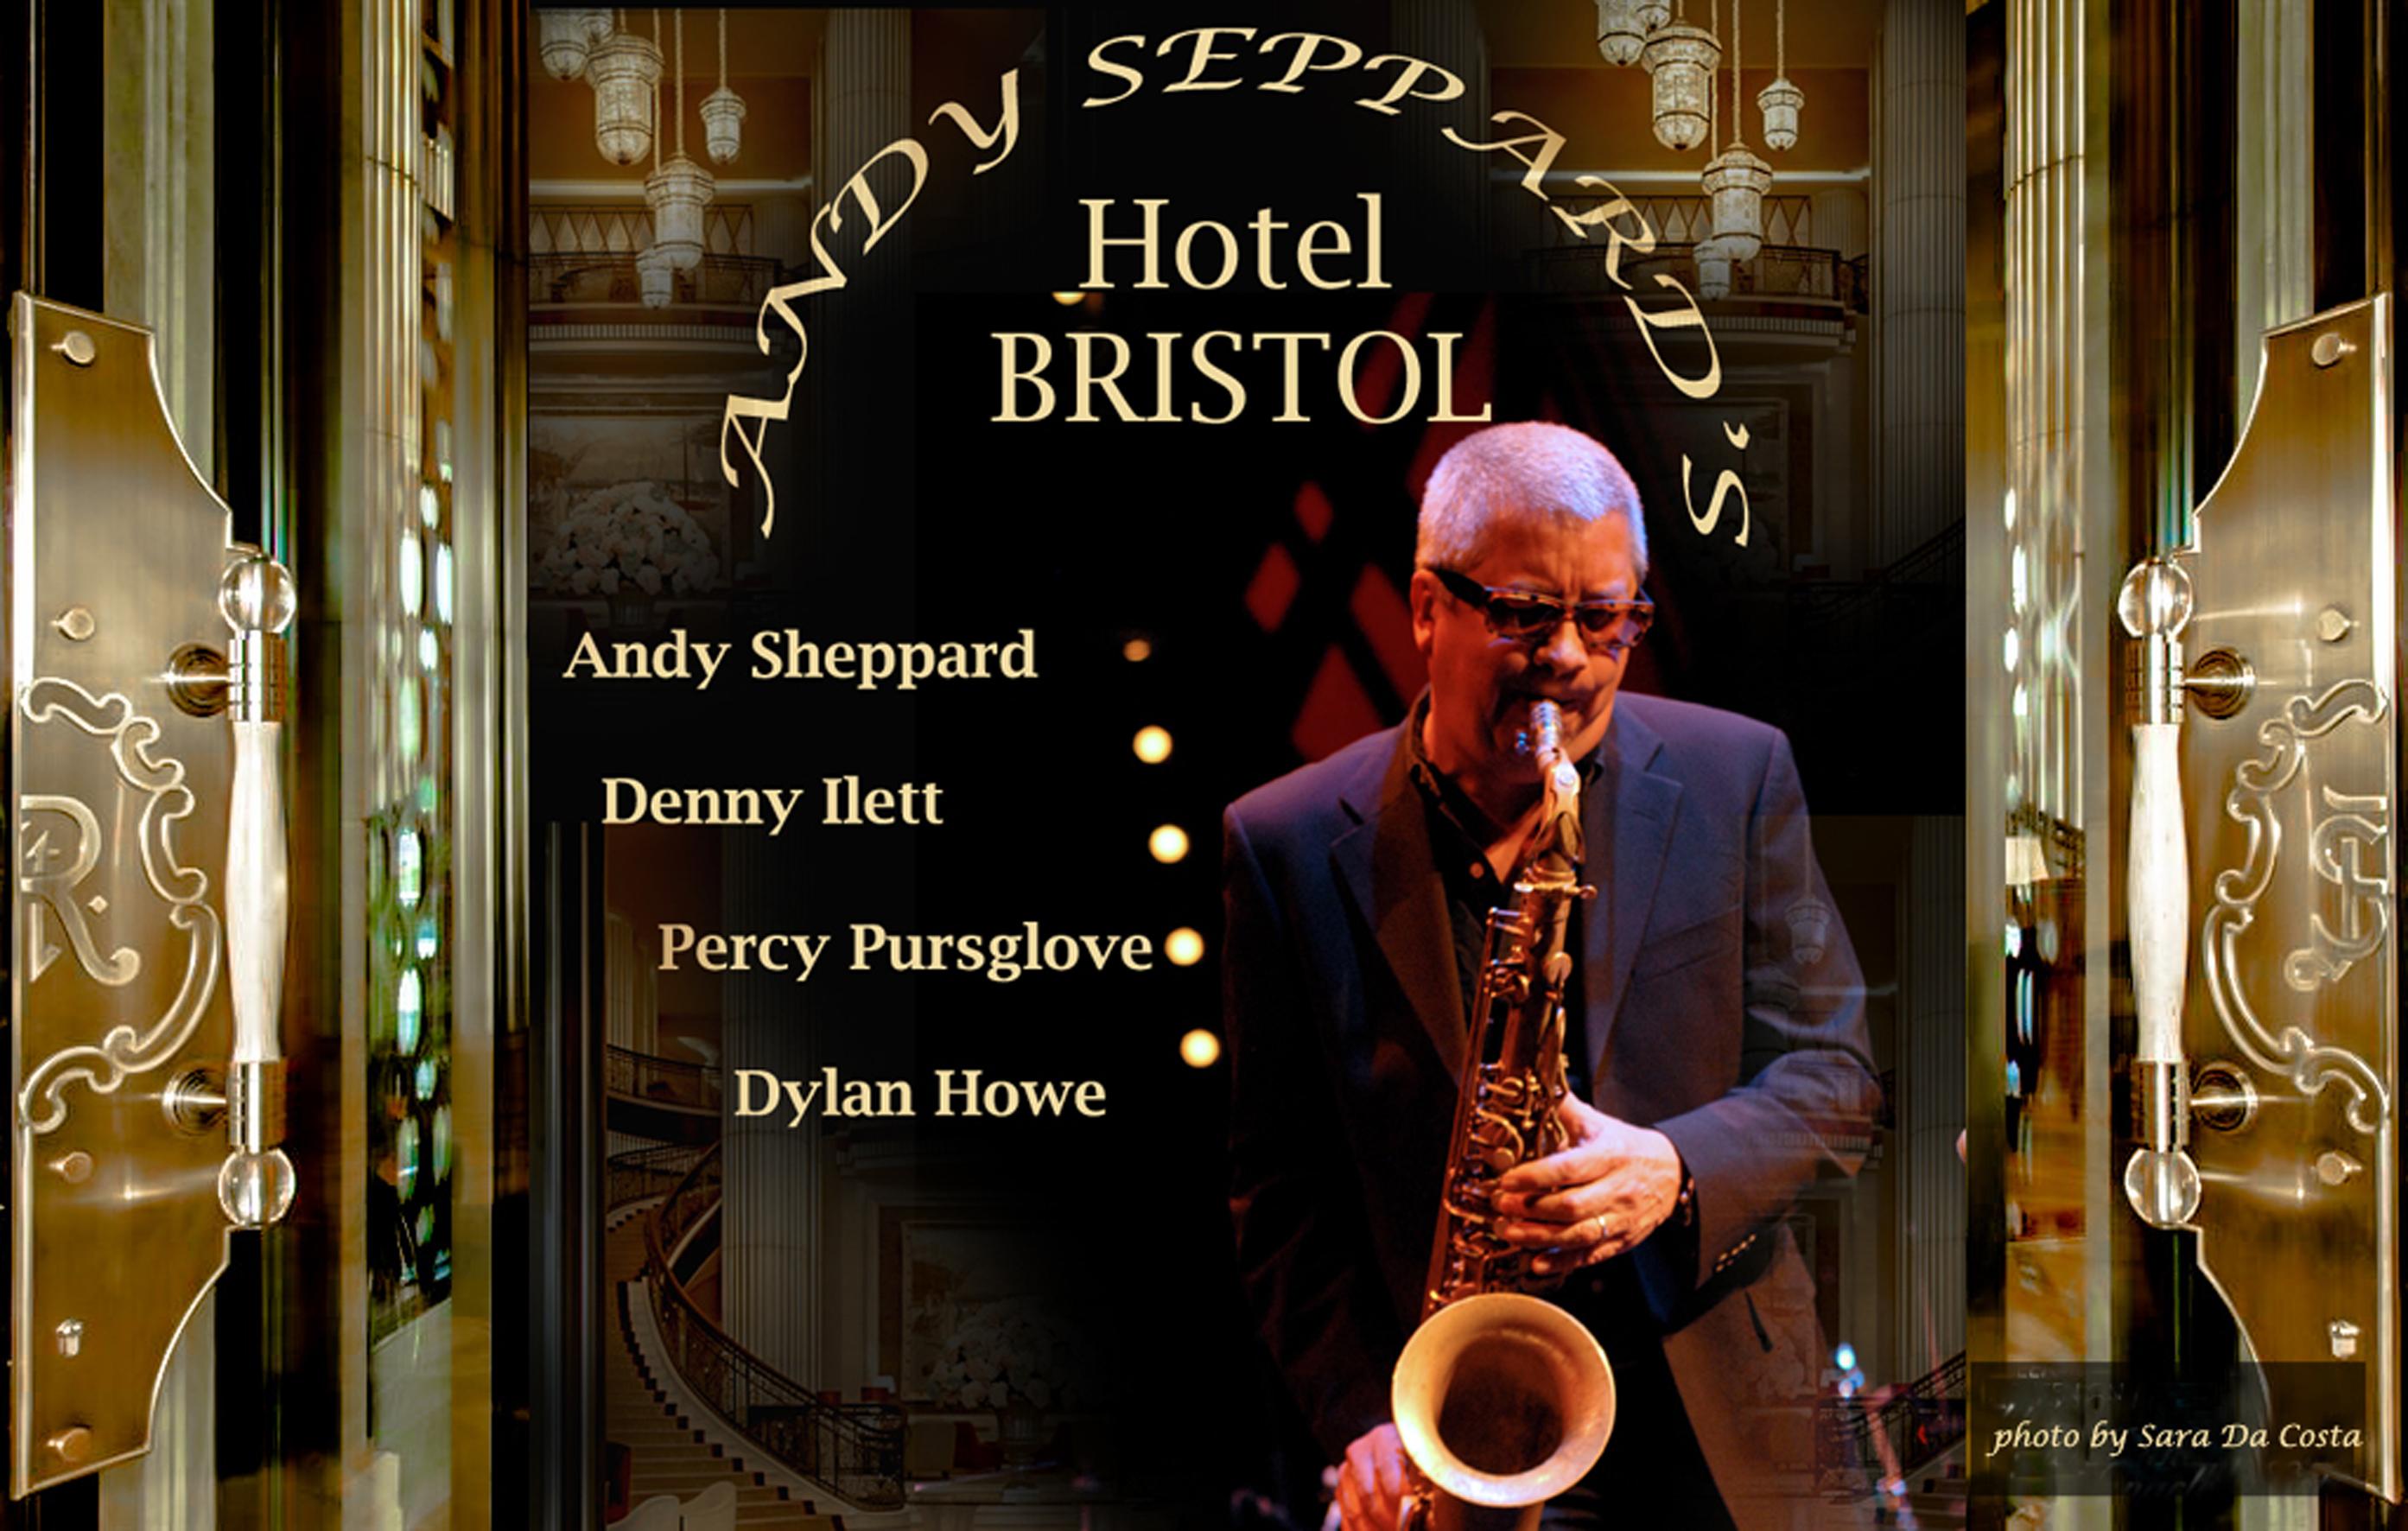 HotelBristolFlyerBIG - Andy Sheppard